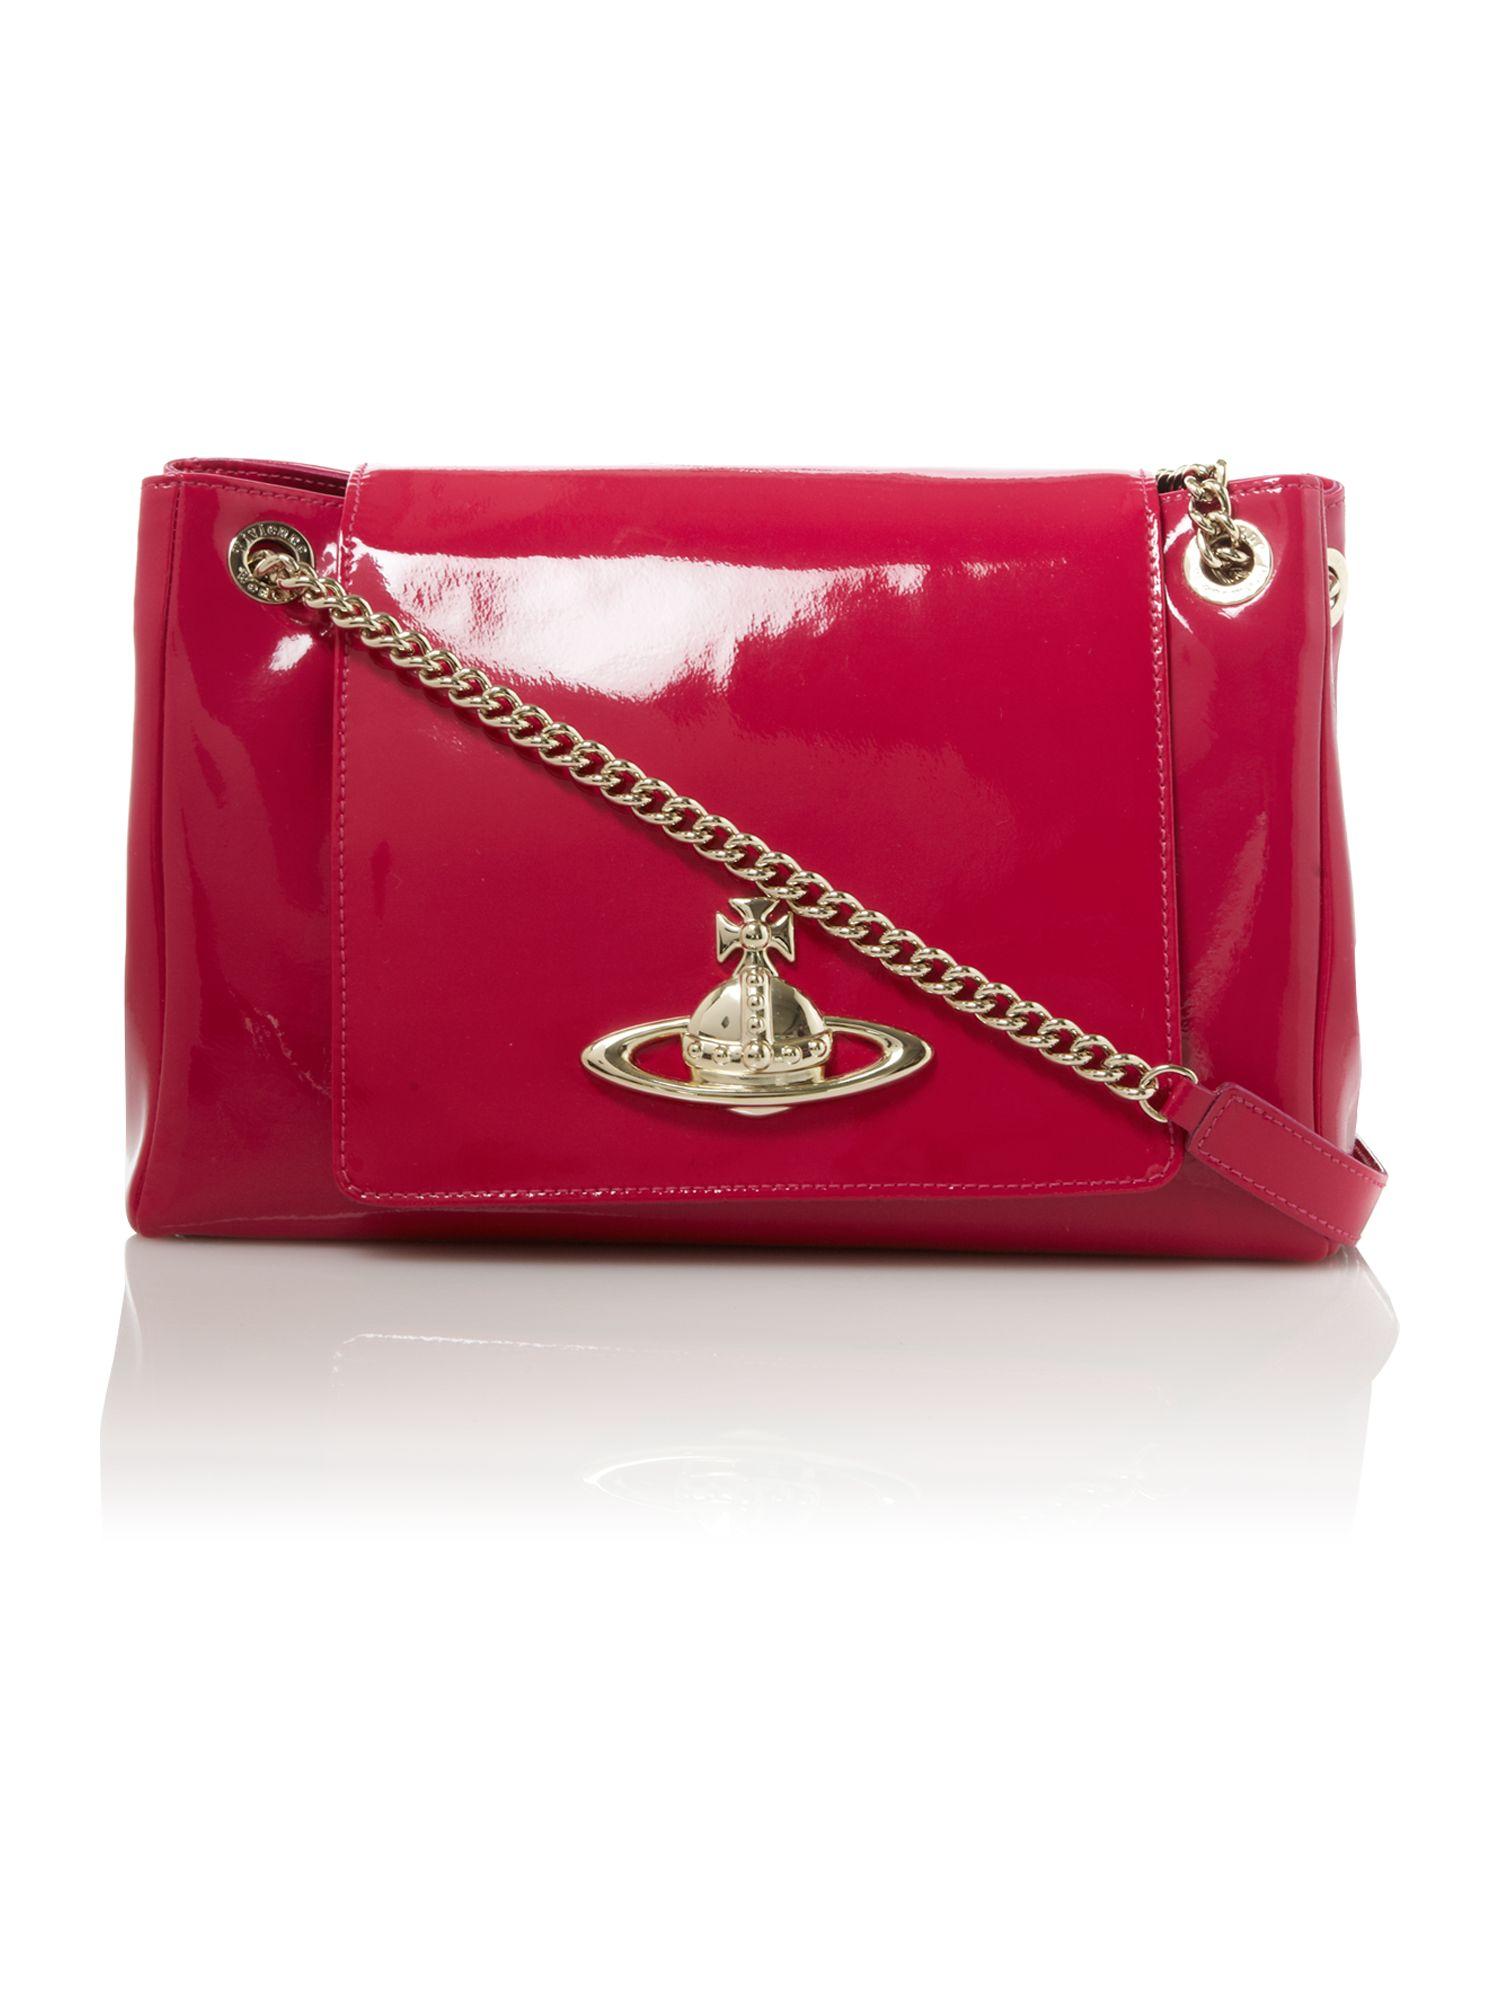 Vivienne Westwood Apollo Shoulder Bag 59